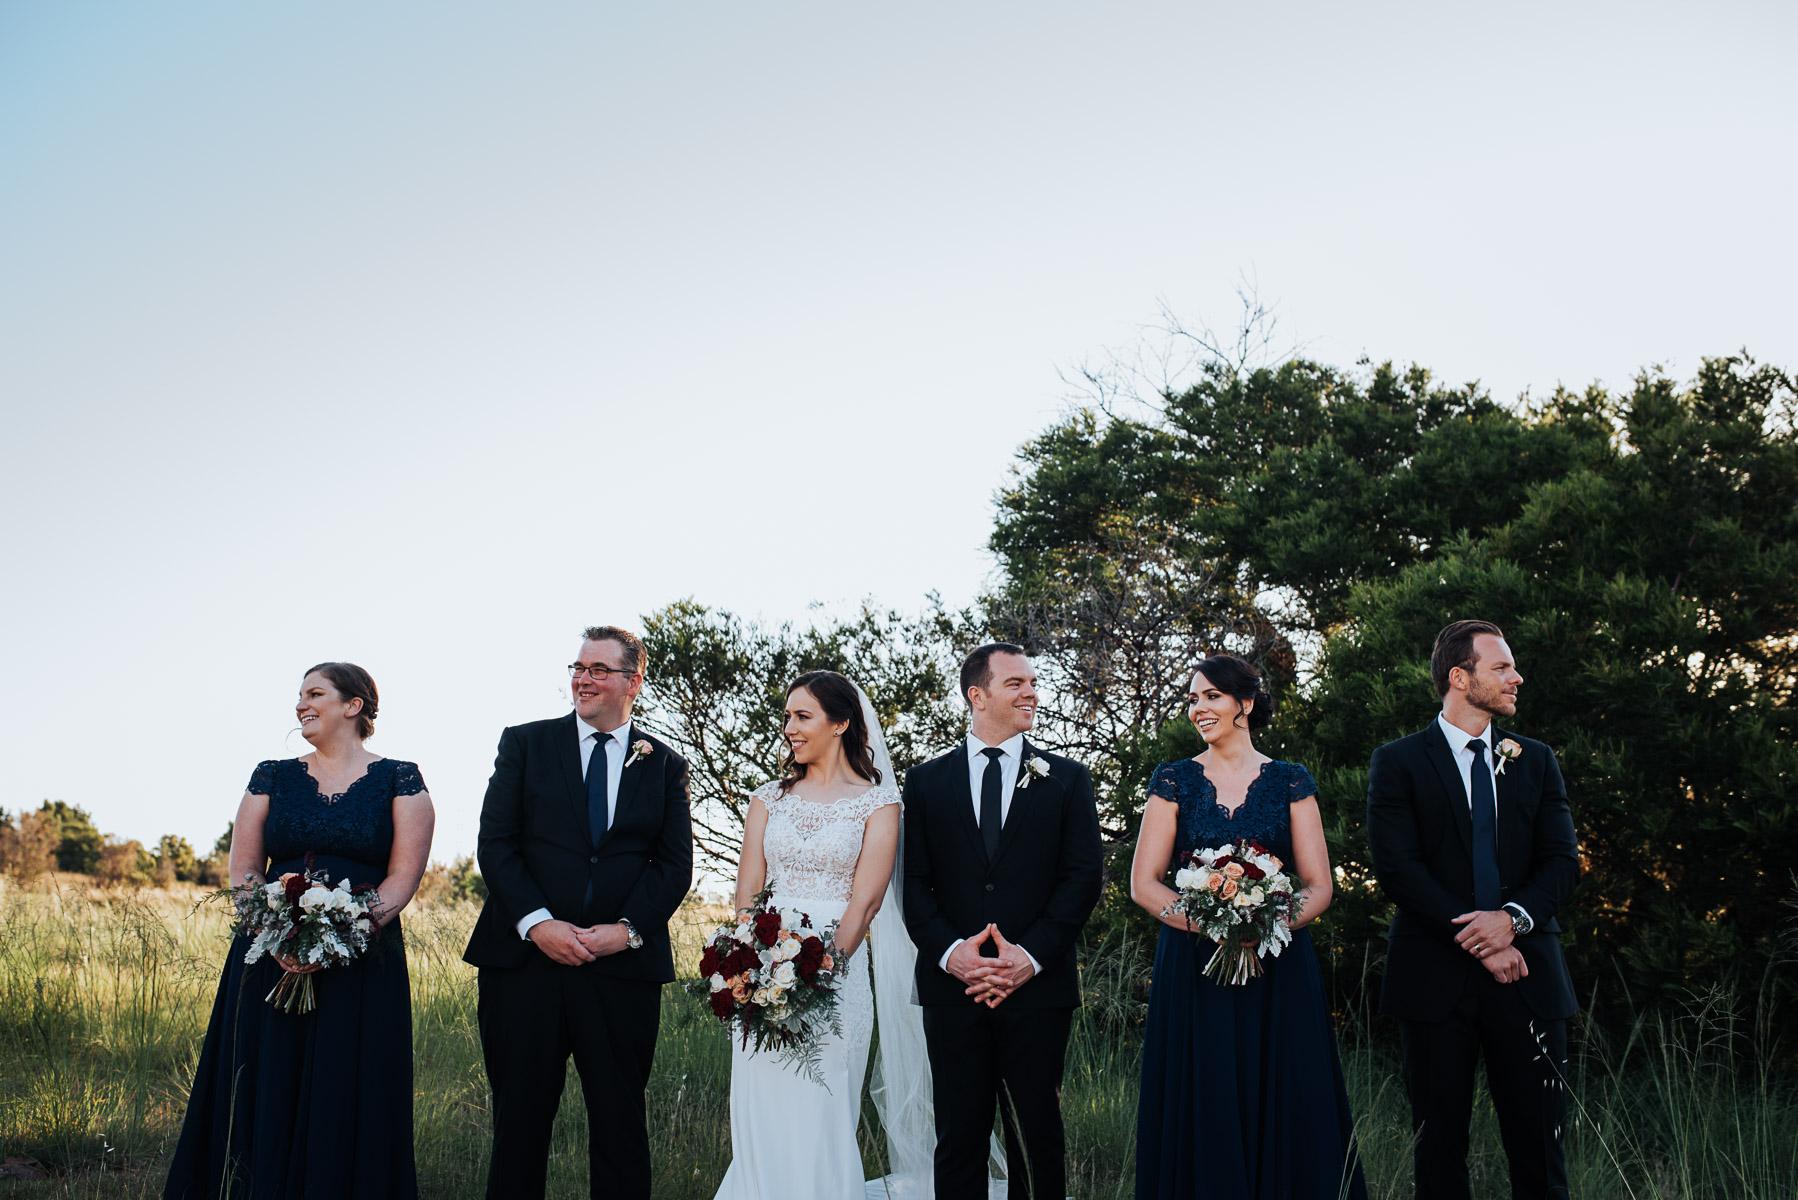 paige-john-chapel-farm-wedding-49.JPG